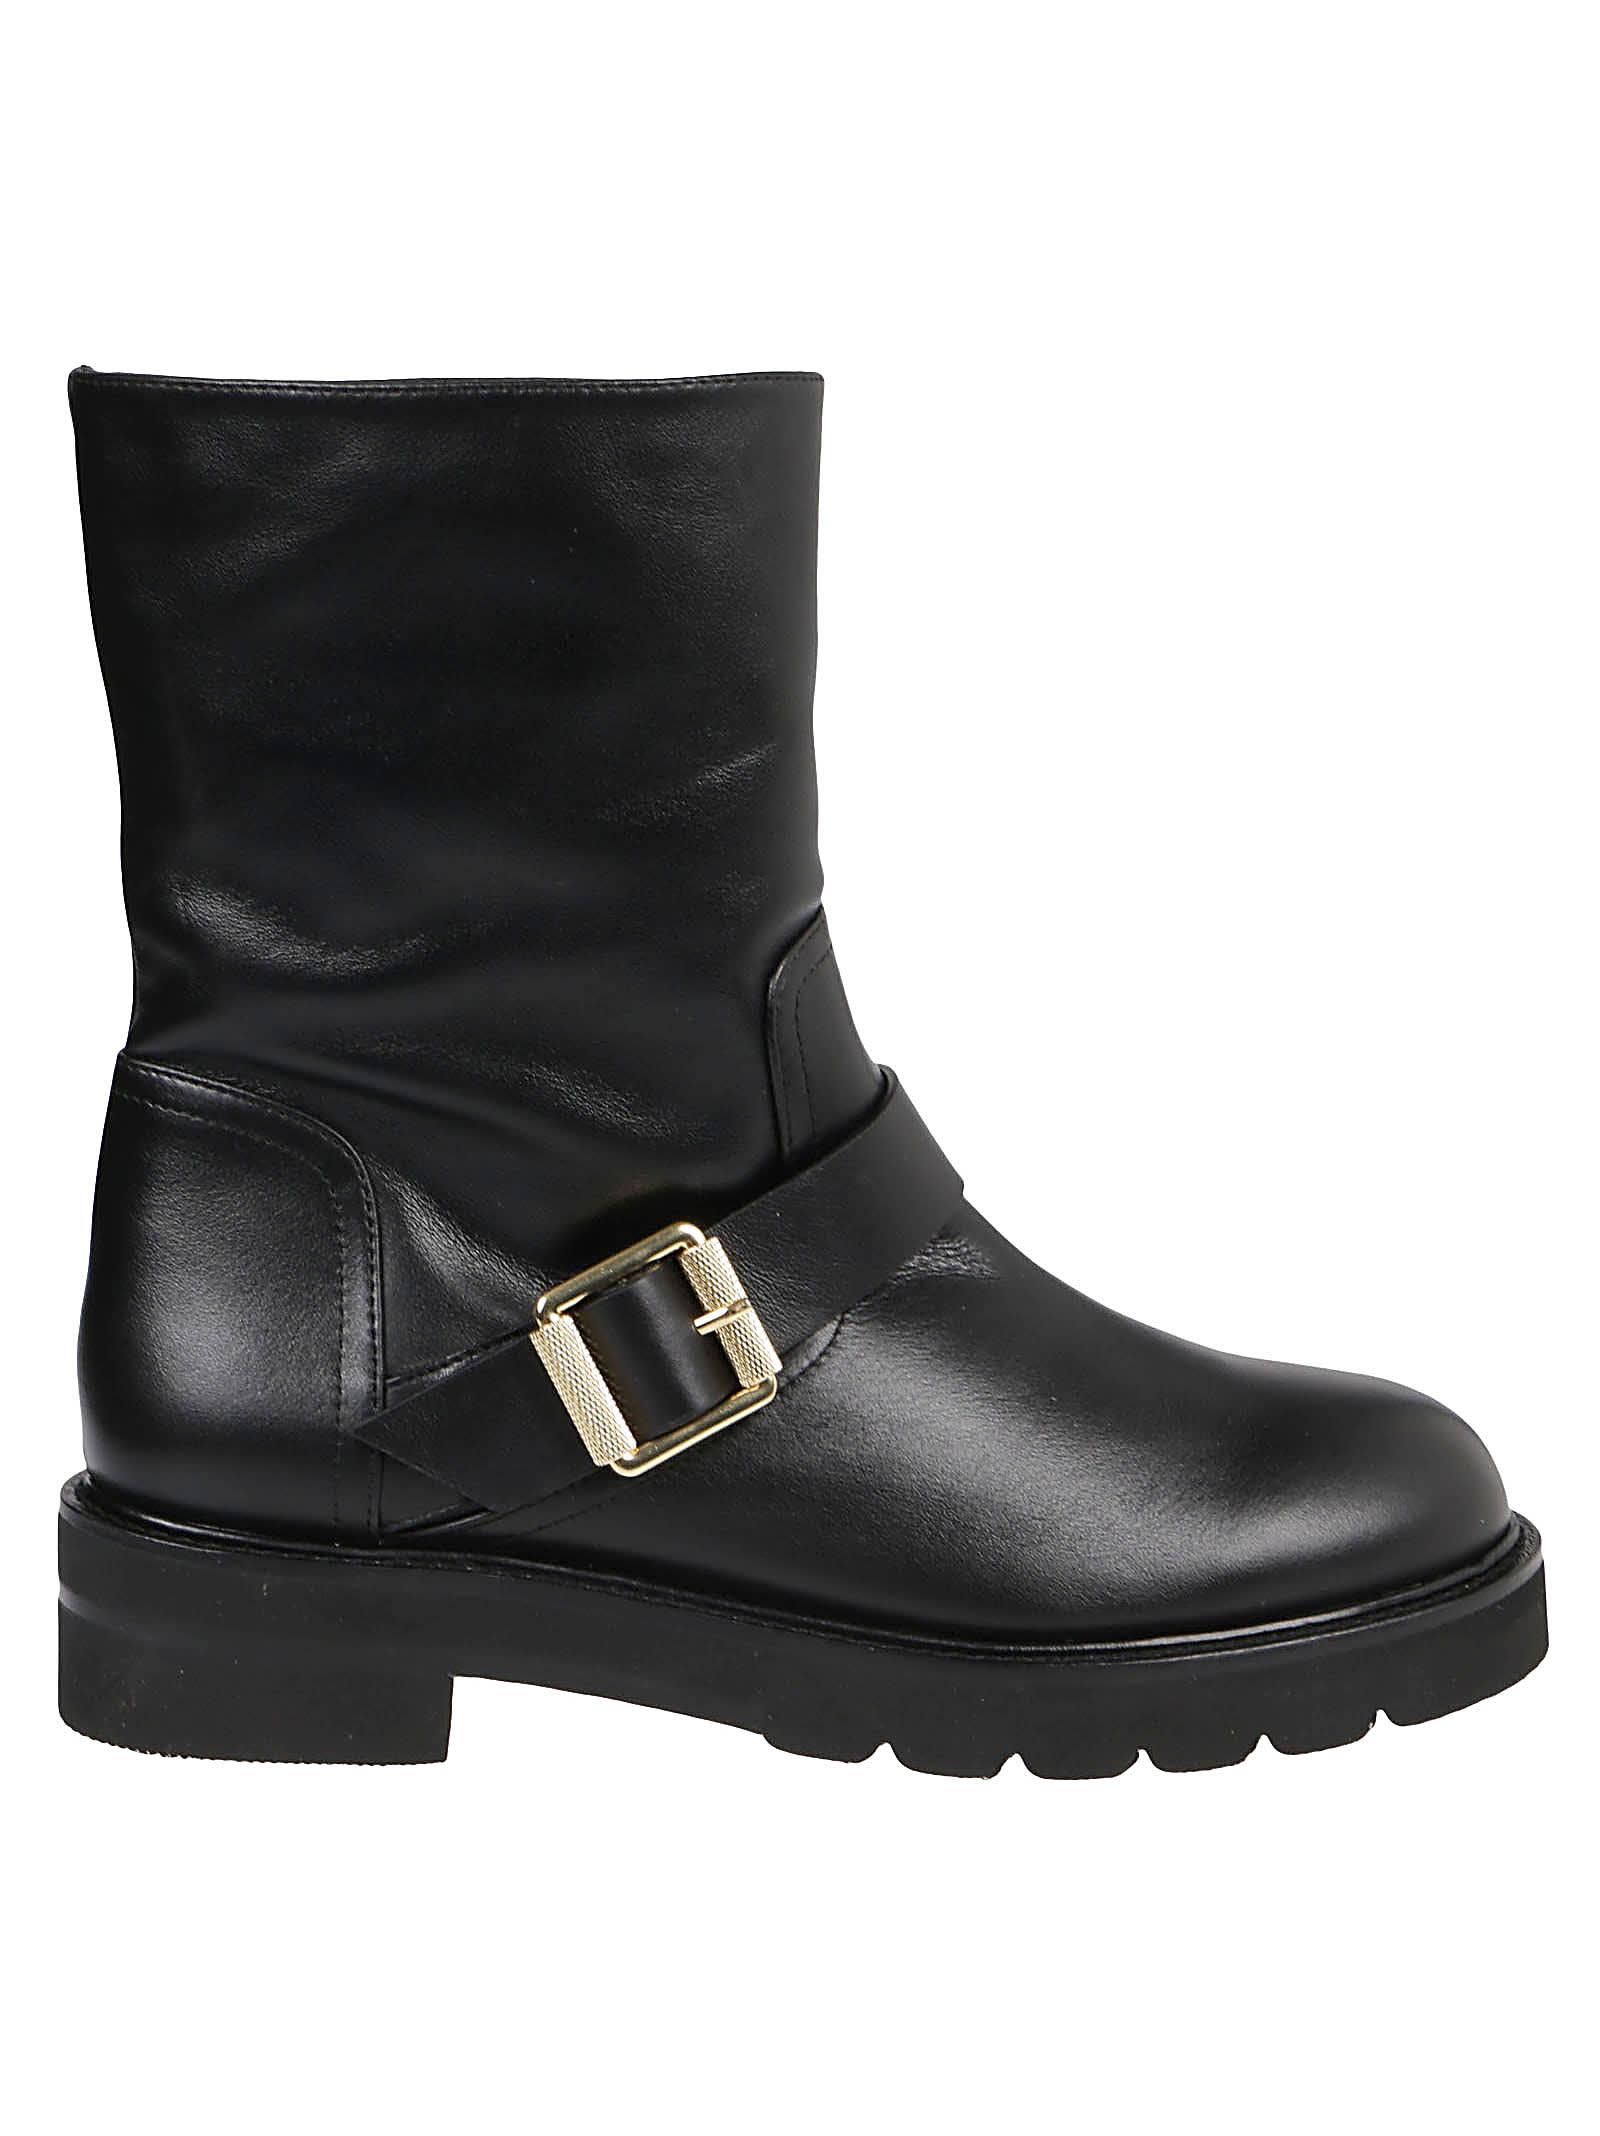 Buy Stuart Weitzman Ryder Lift Boots online, shop Stuart Weitzman shoes with free shipping